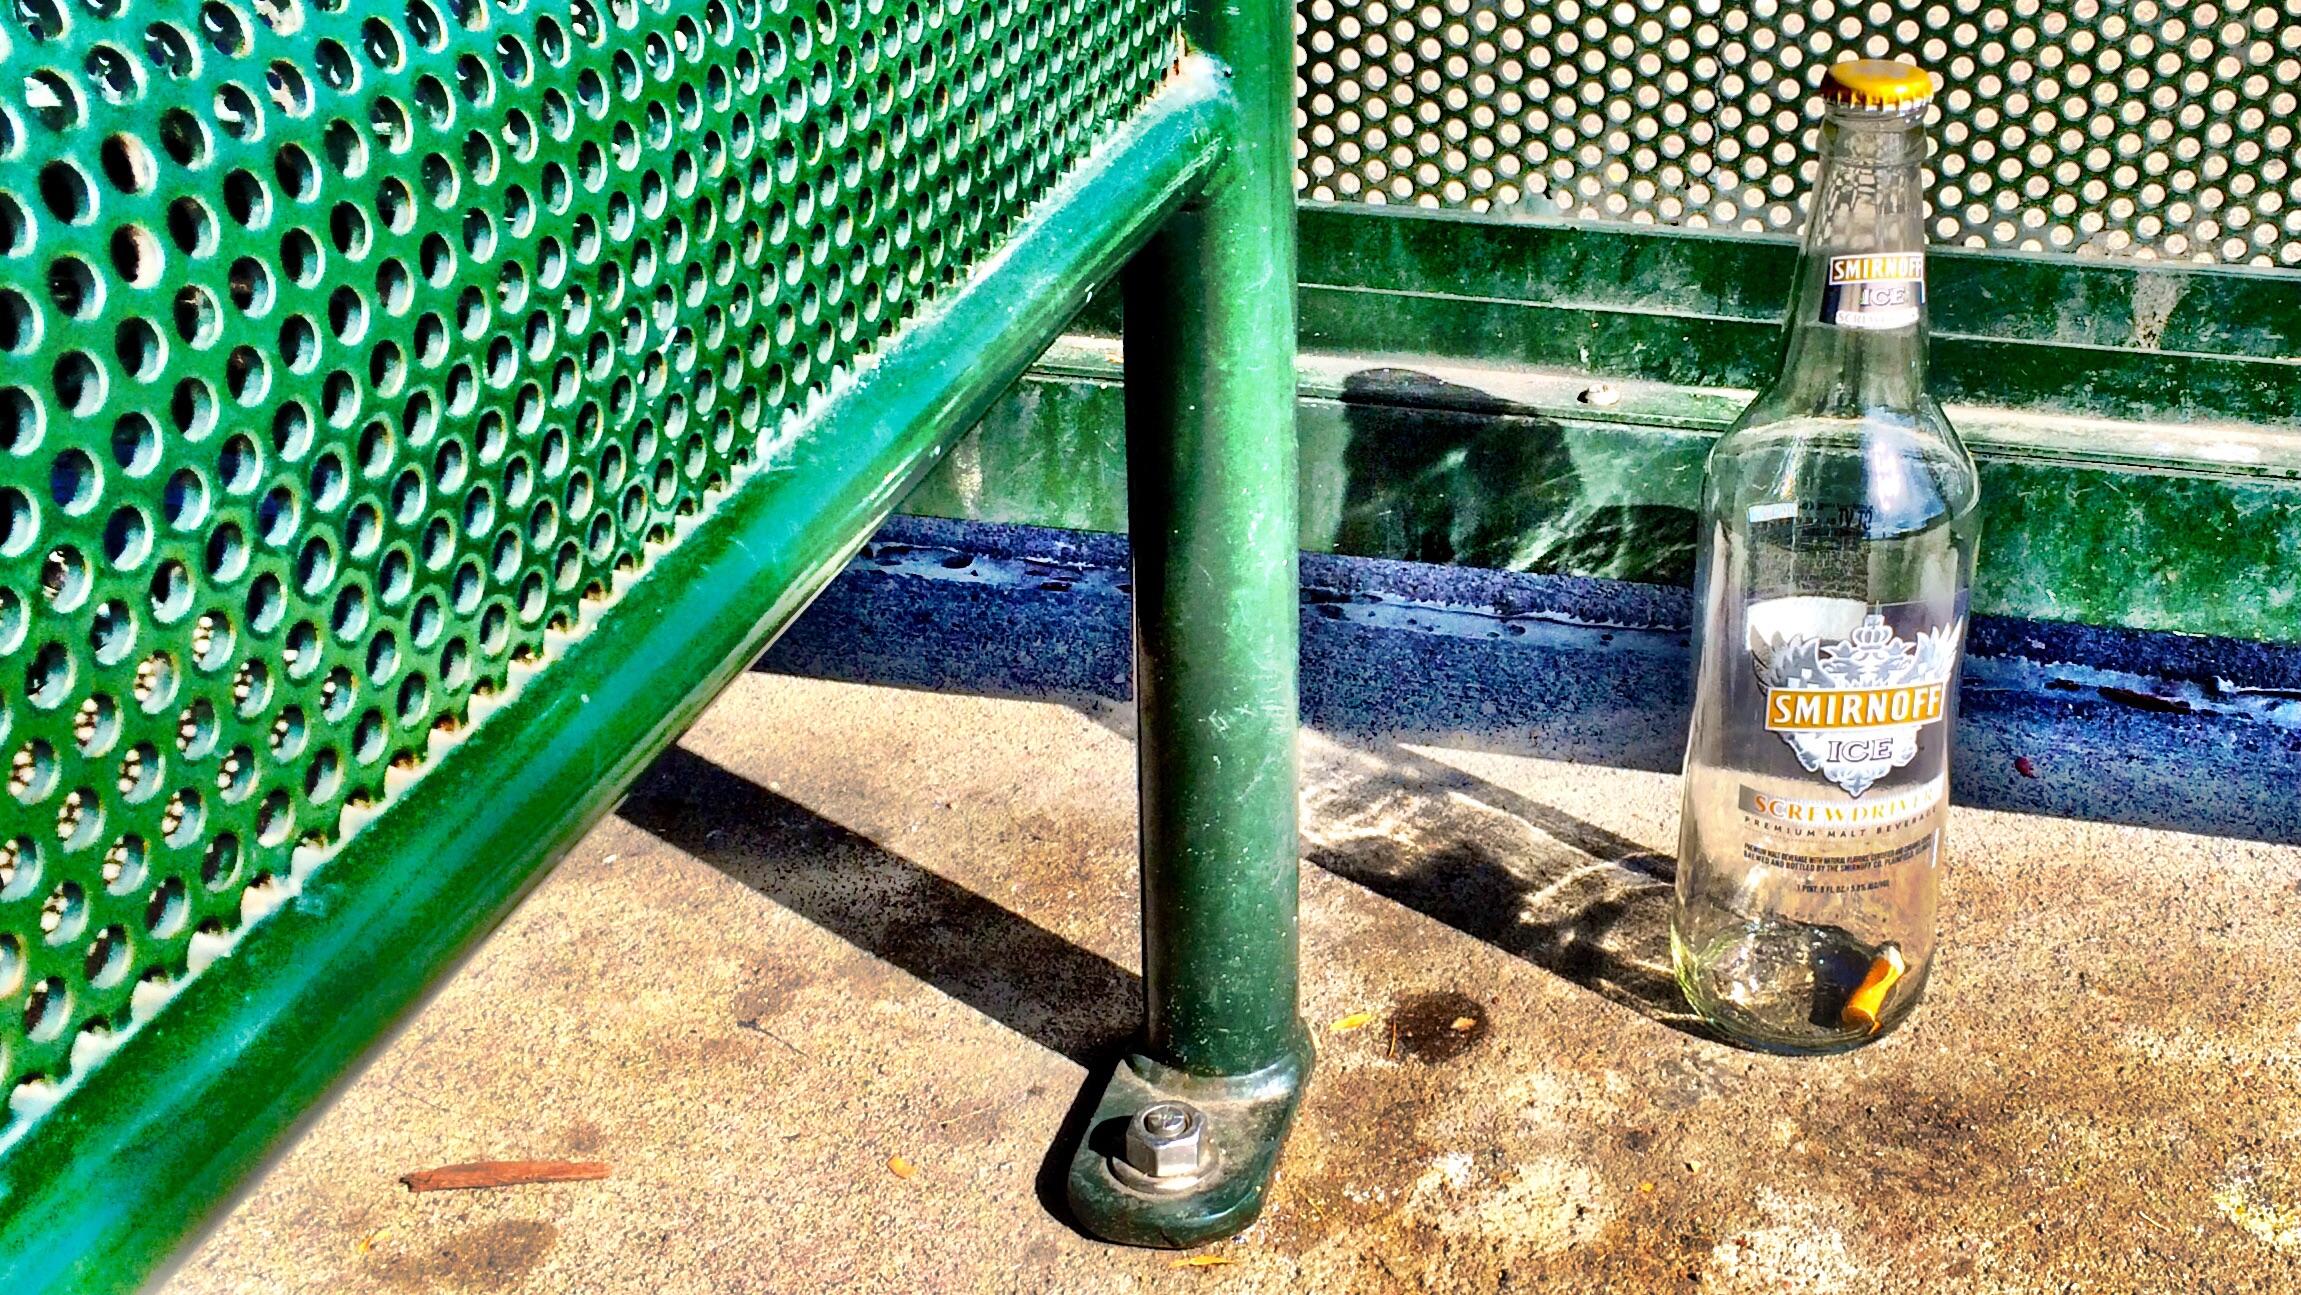 Smirnoff Ice bottle at a bus stop in Aurora, CO